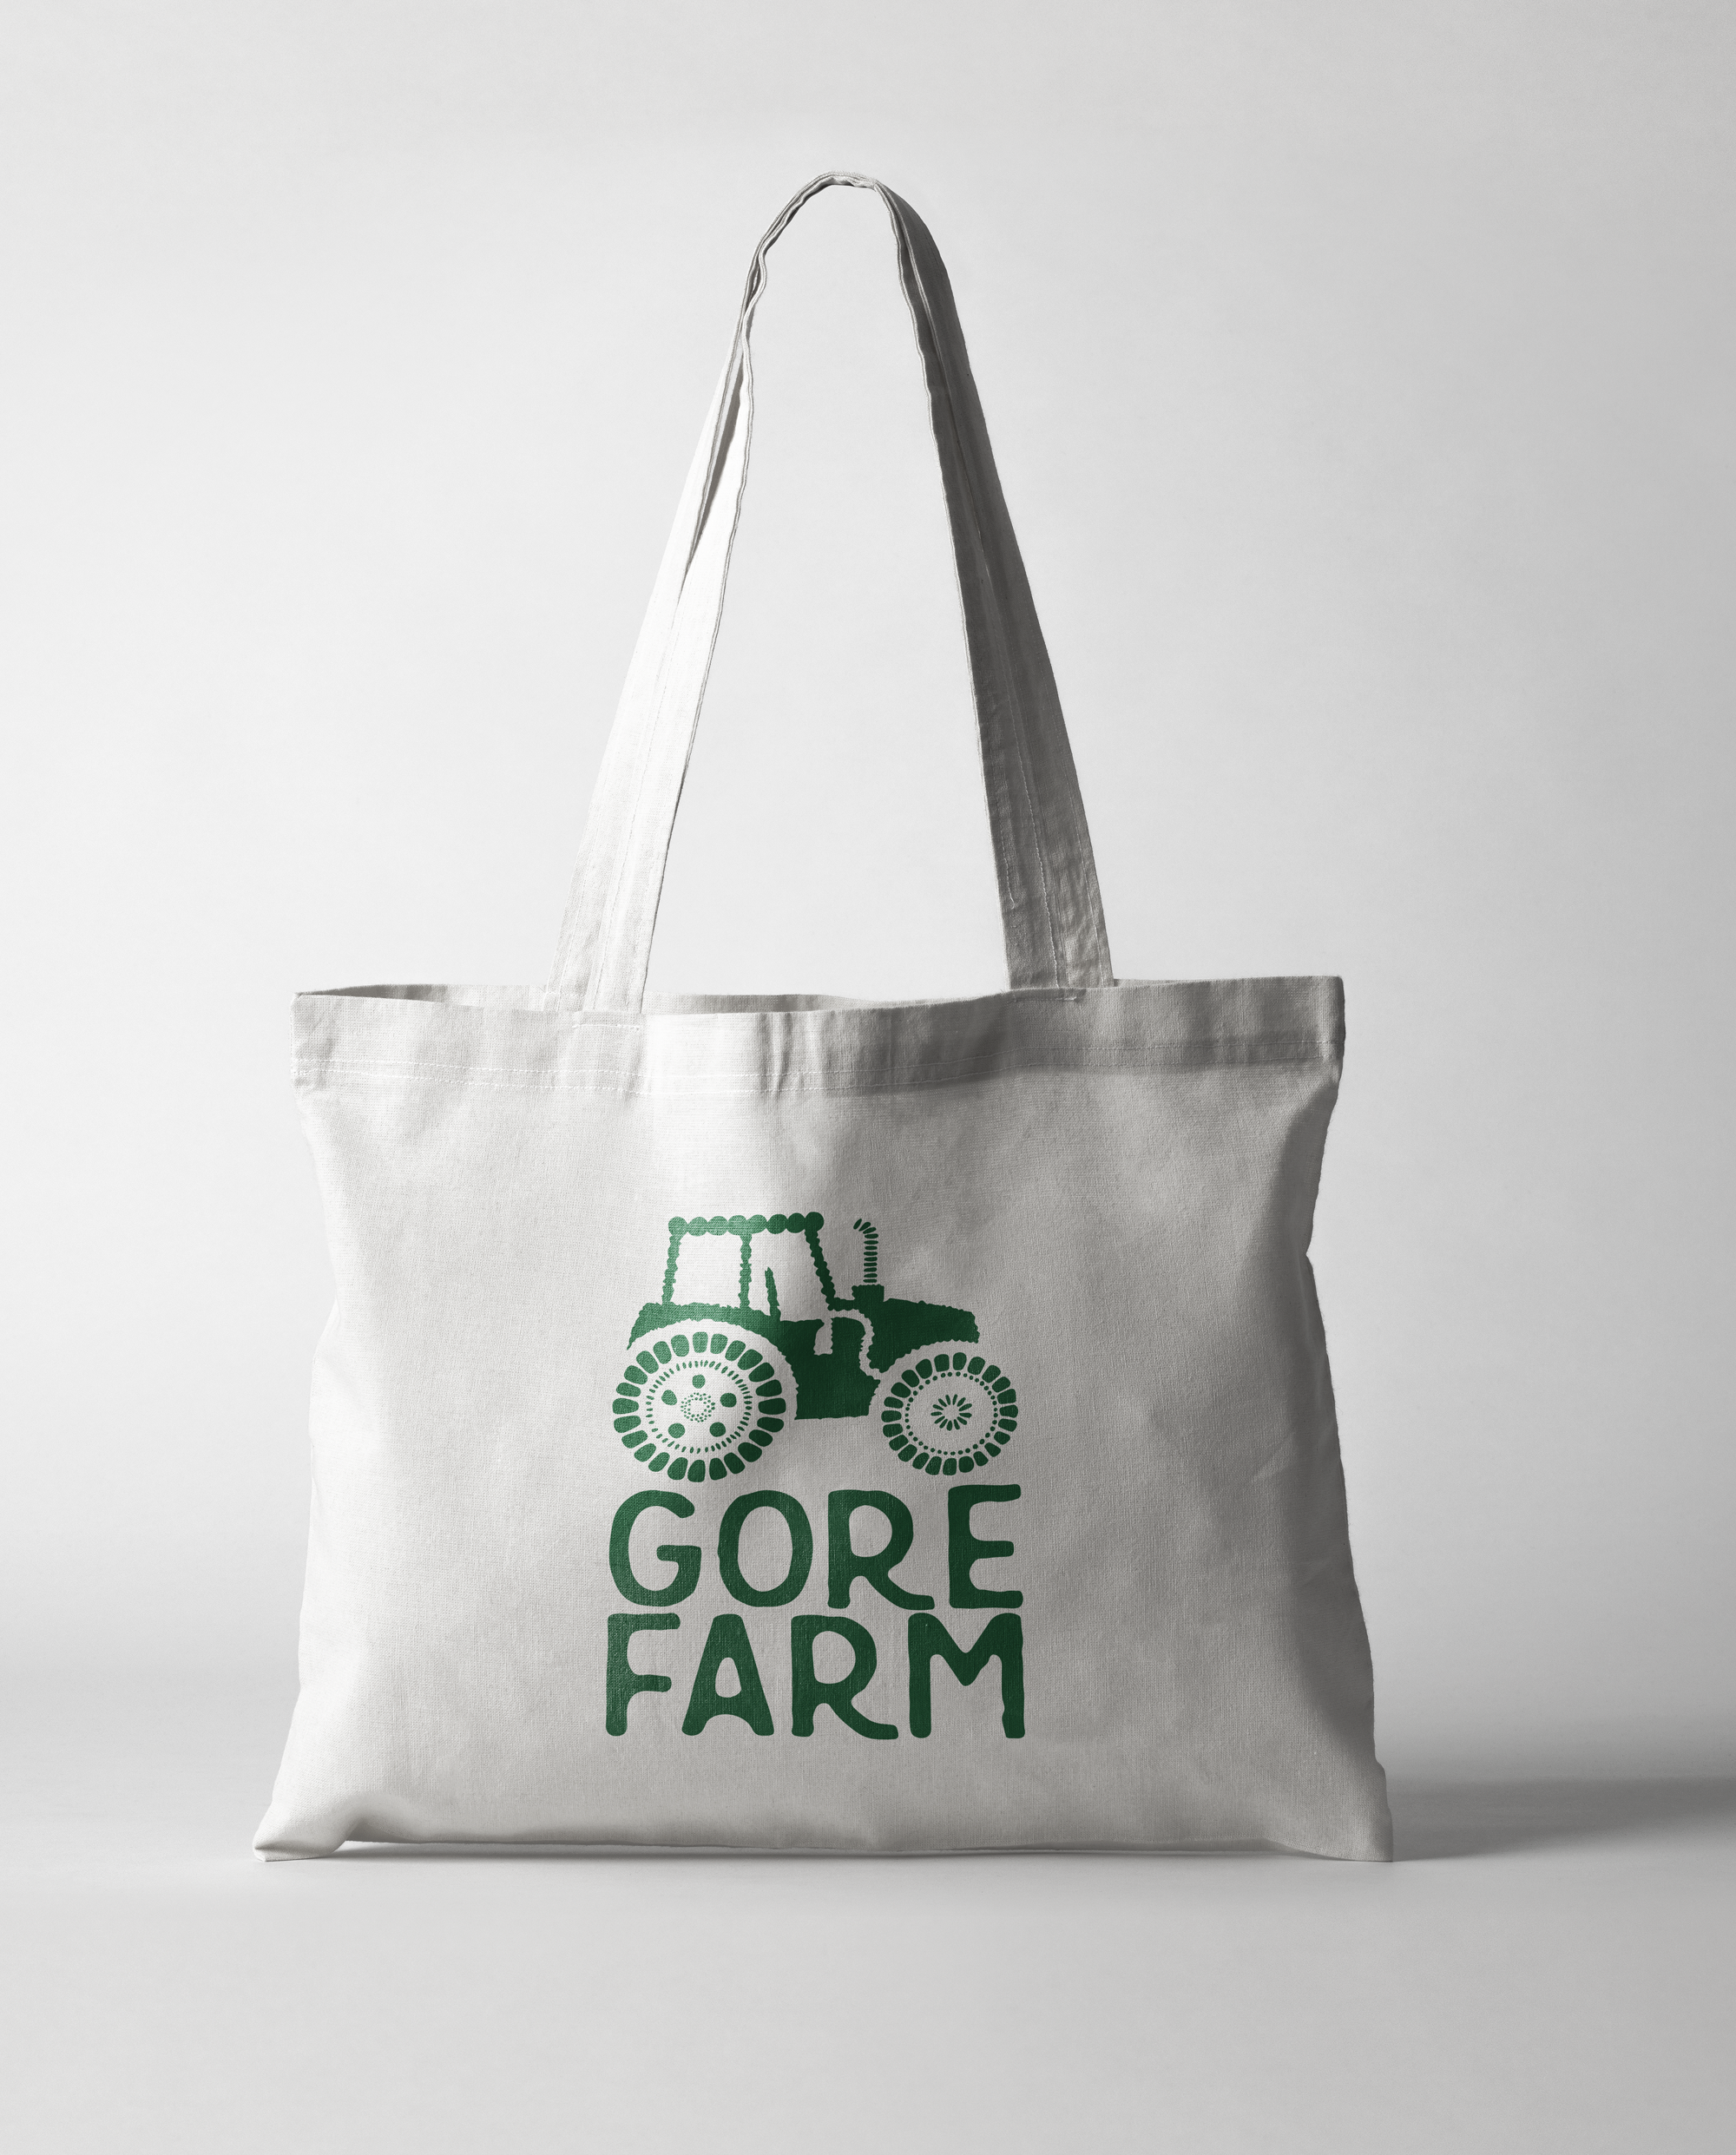 Gore farm logo printed on tote bag